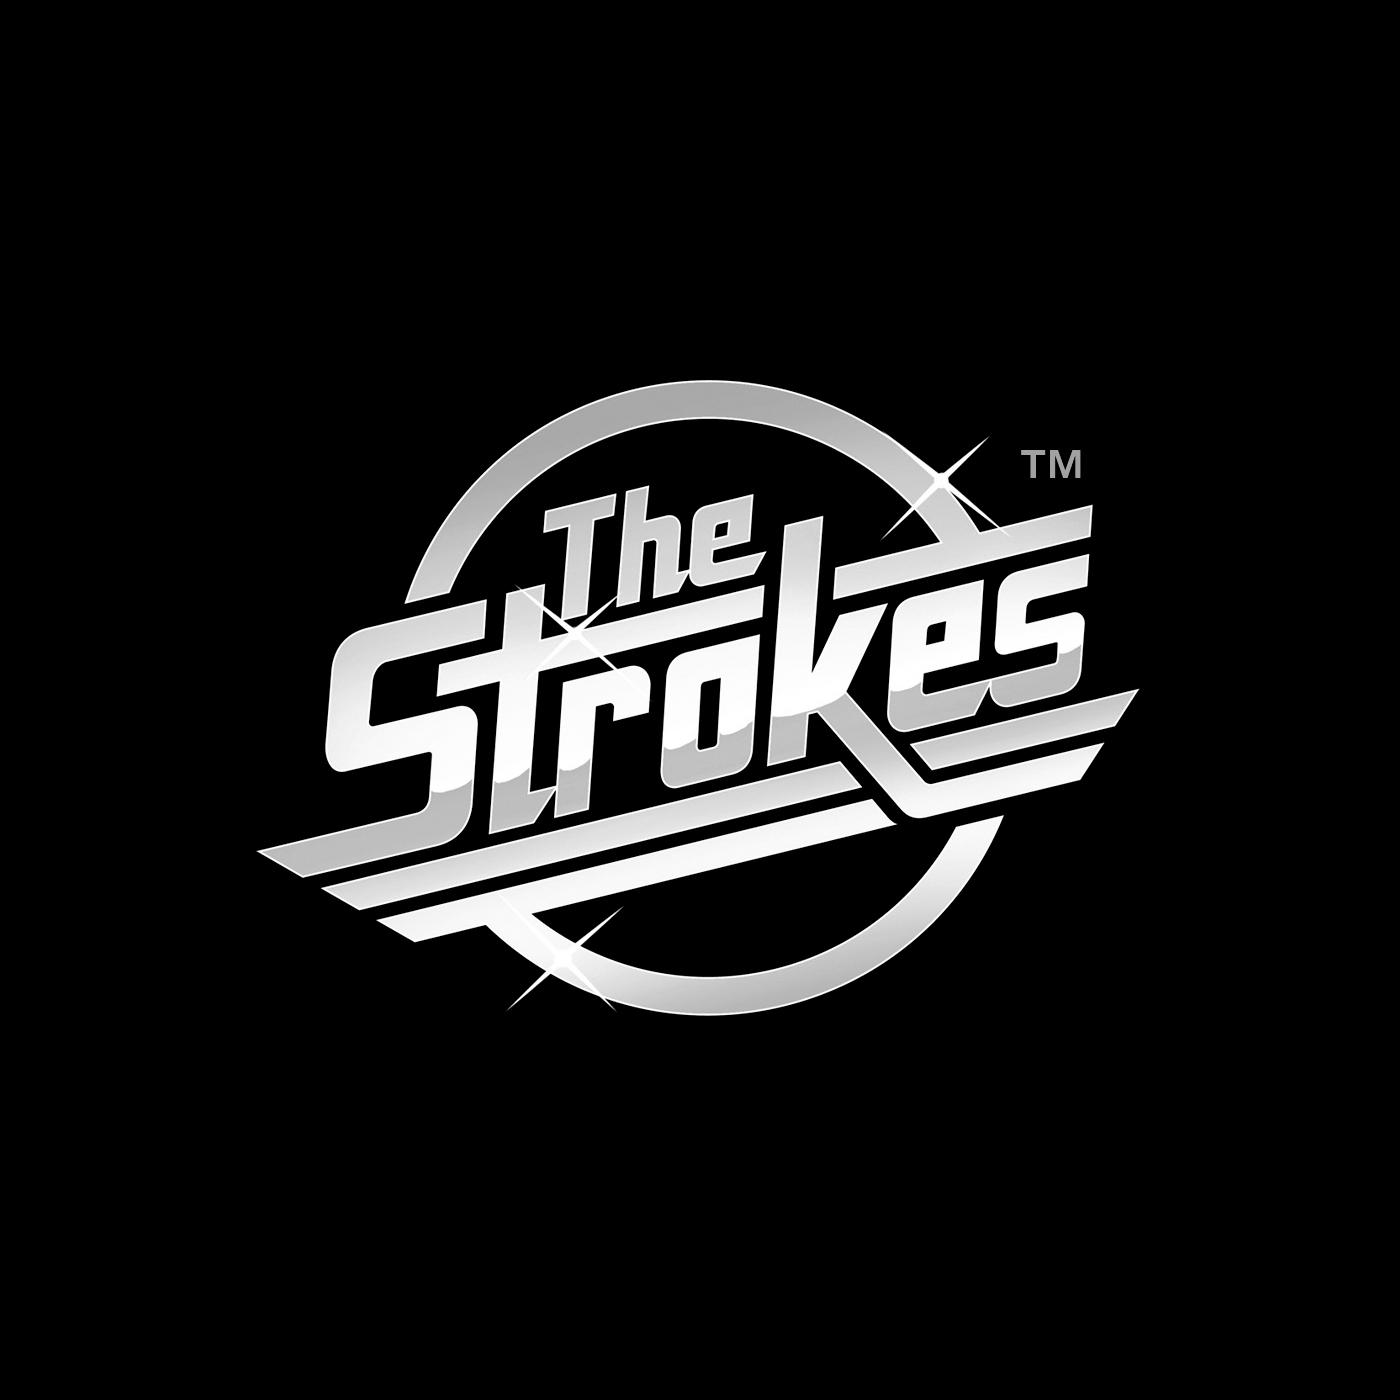 TheStrokes_logo_Oya2020